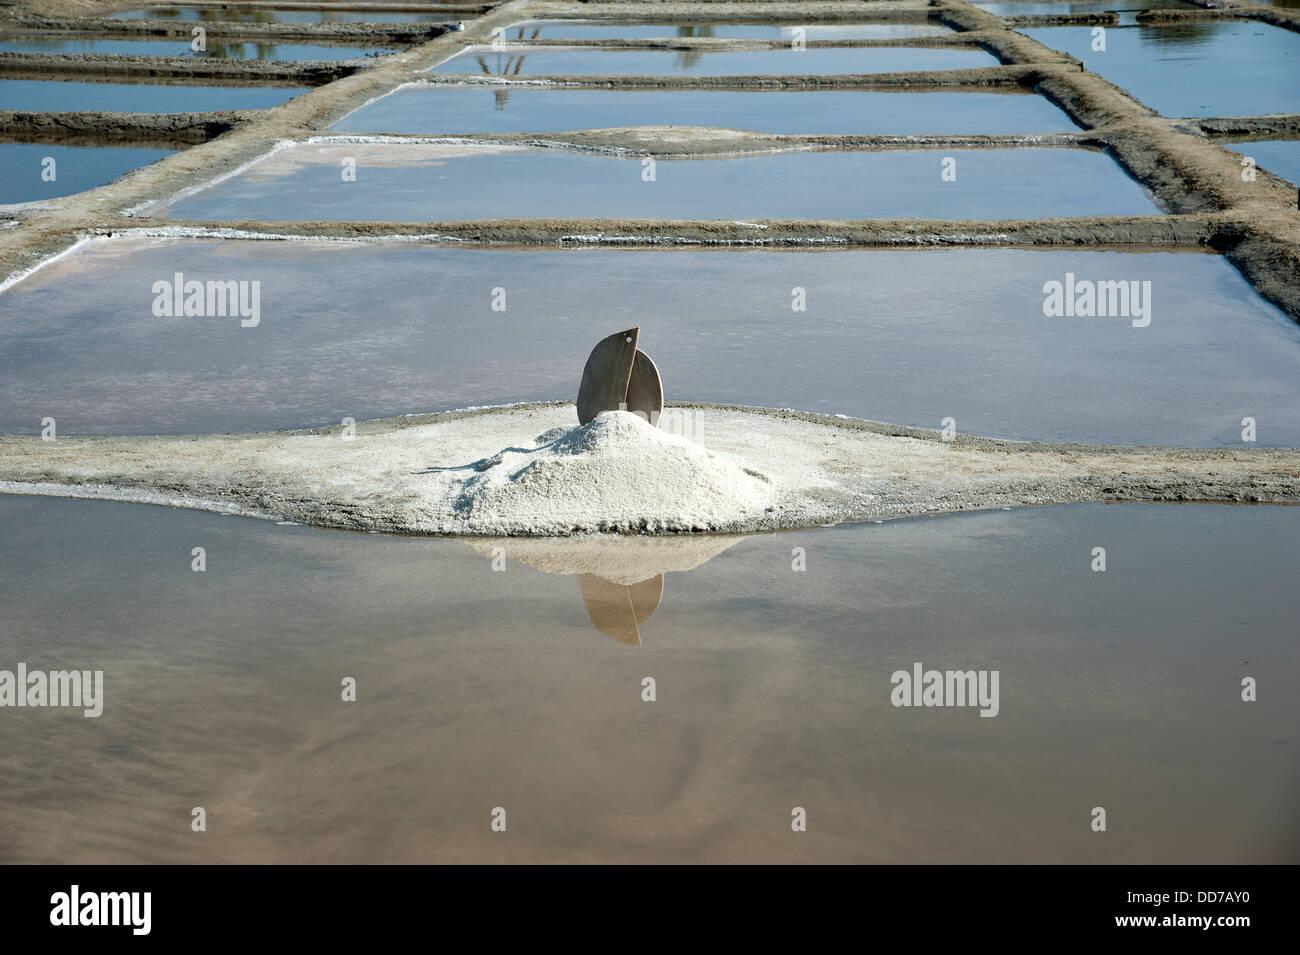 Farming for salt at Les Sables D' Olonne western France - Stock Image